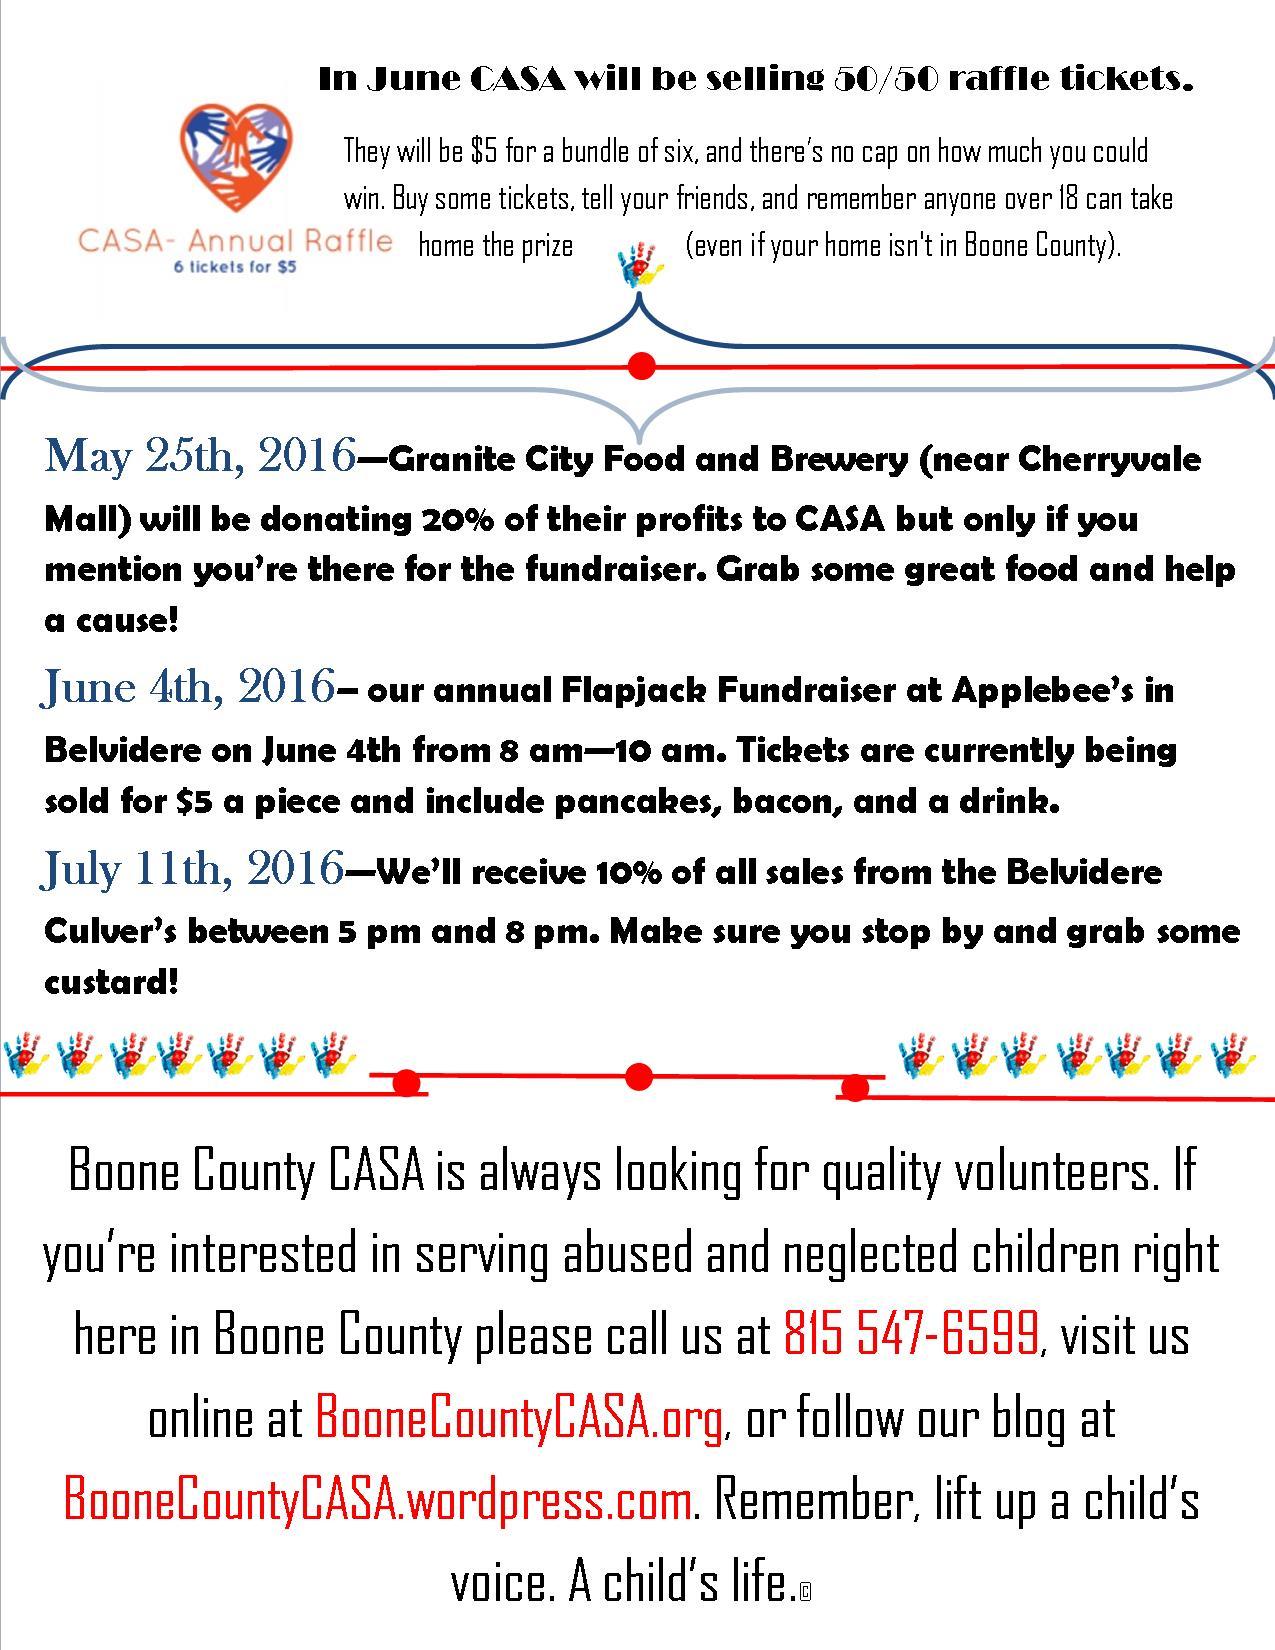 Win And Help Casa Boone County Casa